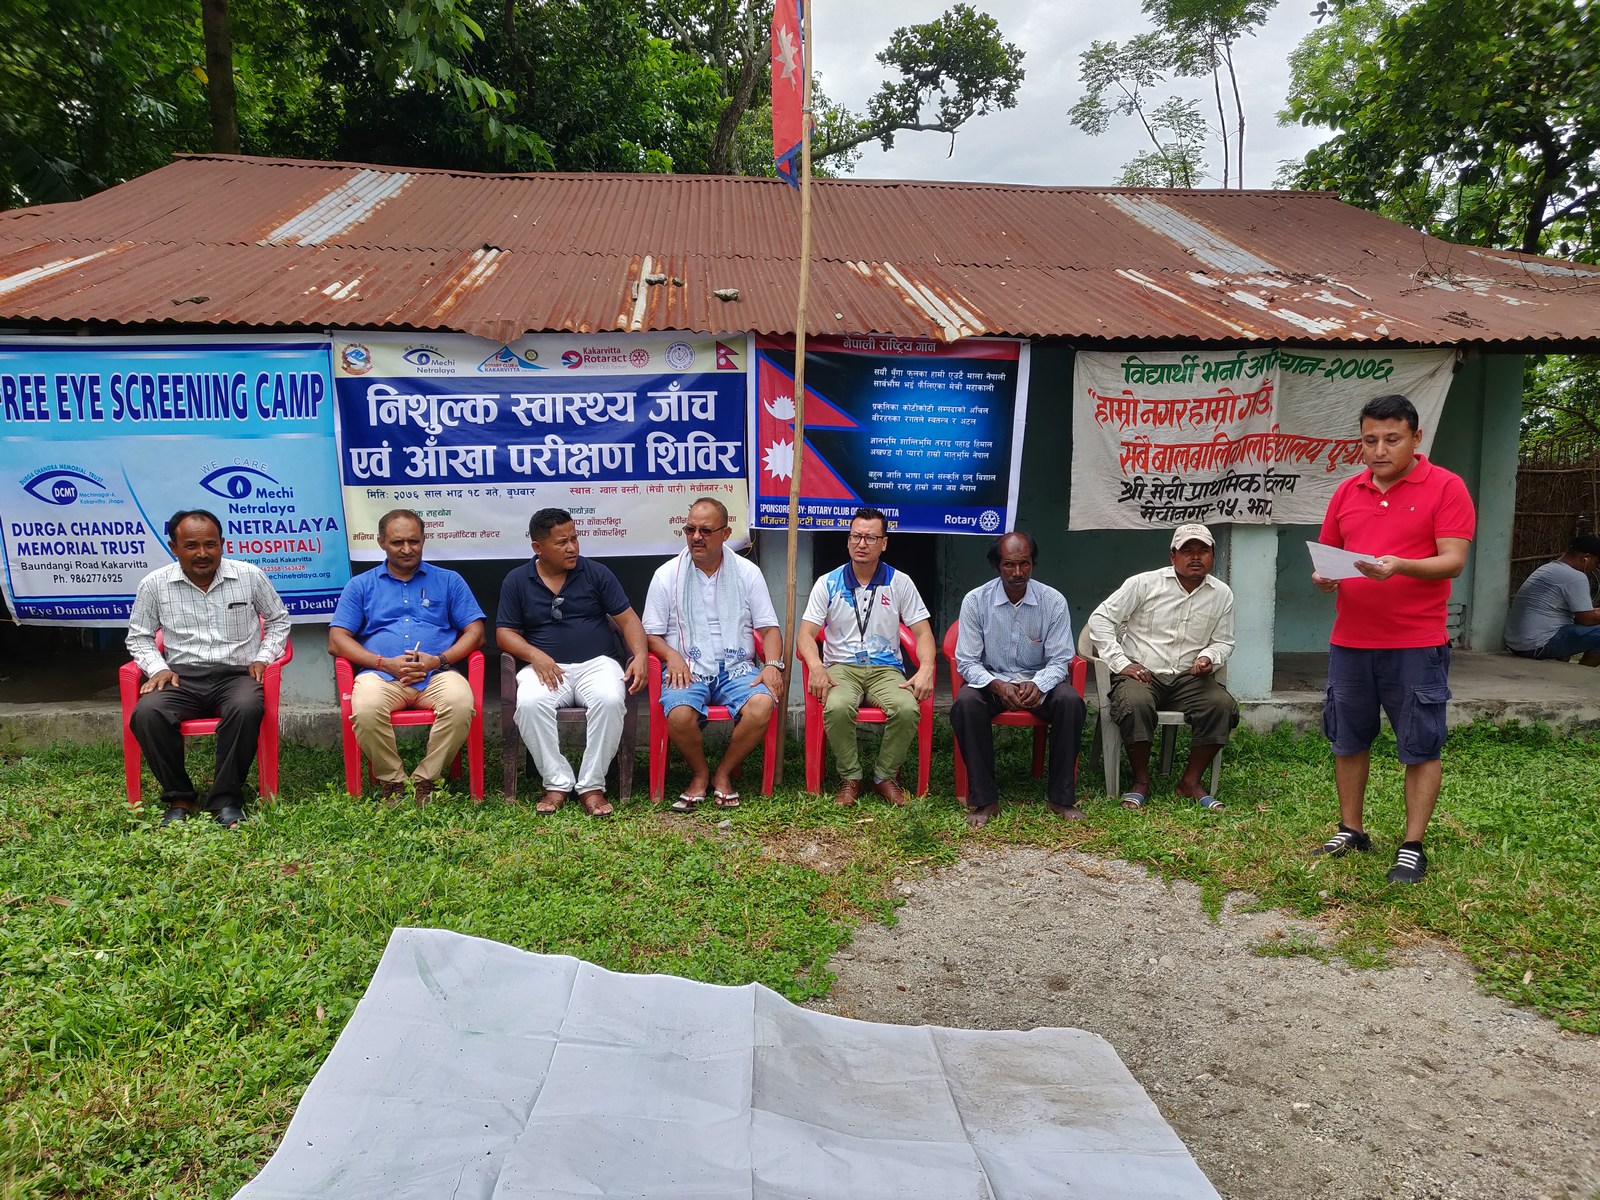 Free-Health-Camp-Eye-Screening-at-Gwala-Basti-Mechinagar-15-Jhapa-Nepal-Rotary-Club-of-Kakarvitta-15